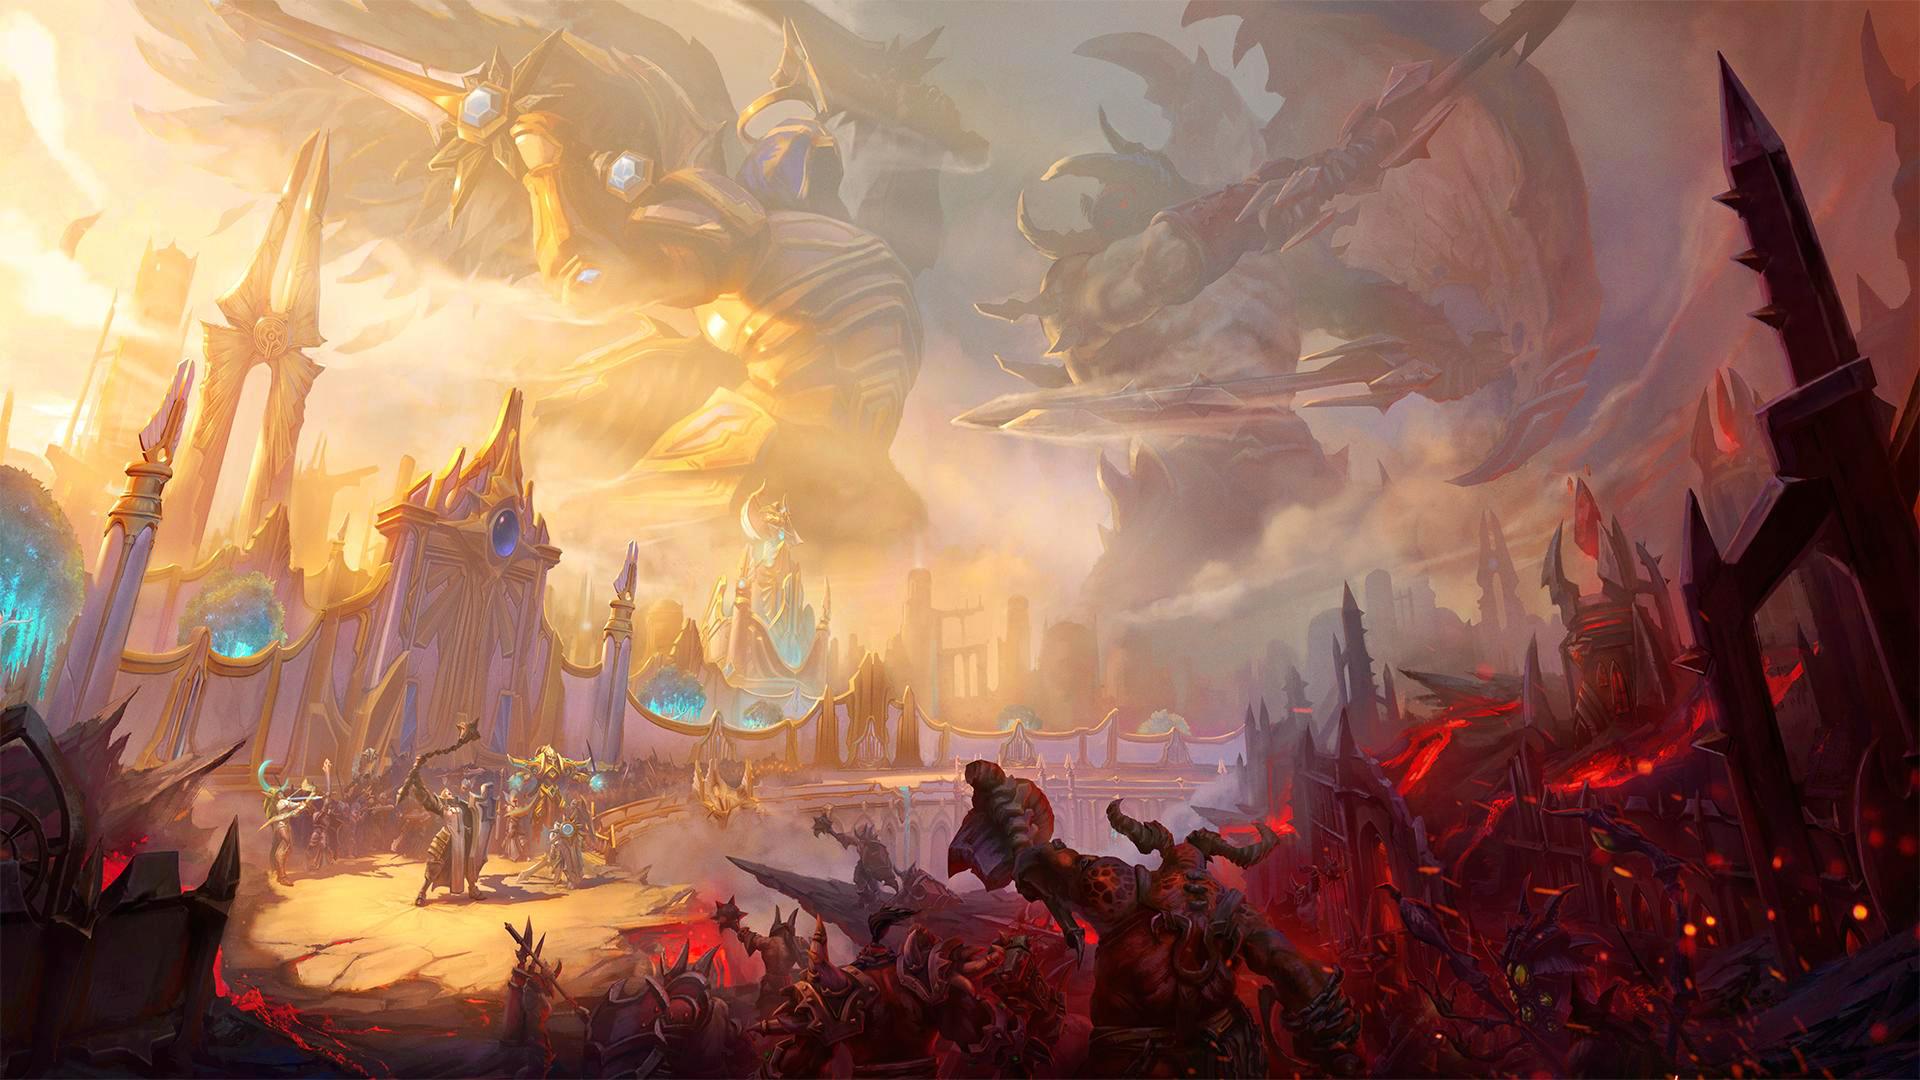 Heroes Of The Storm Blizzard Entertainment Diablo III Battlefield Eternity Screenshot